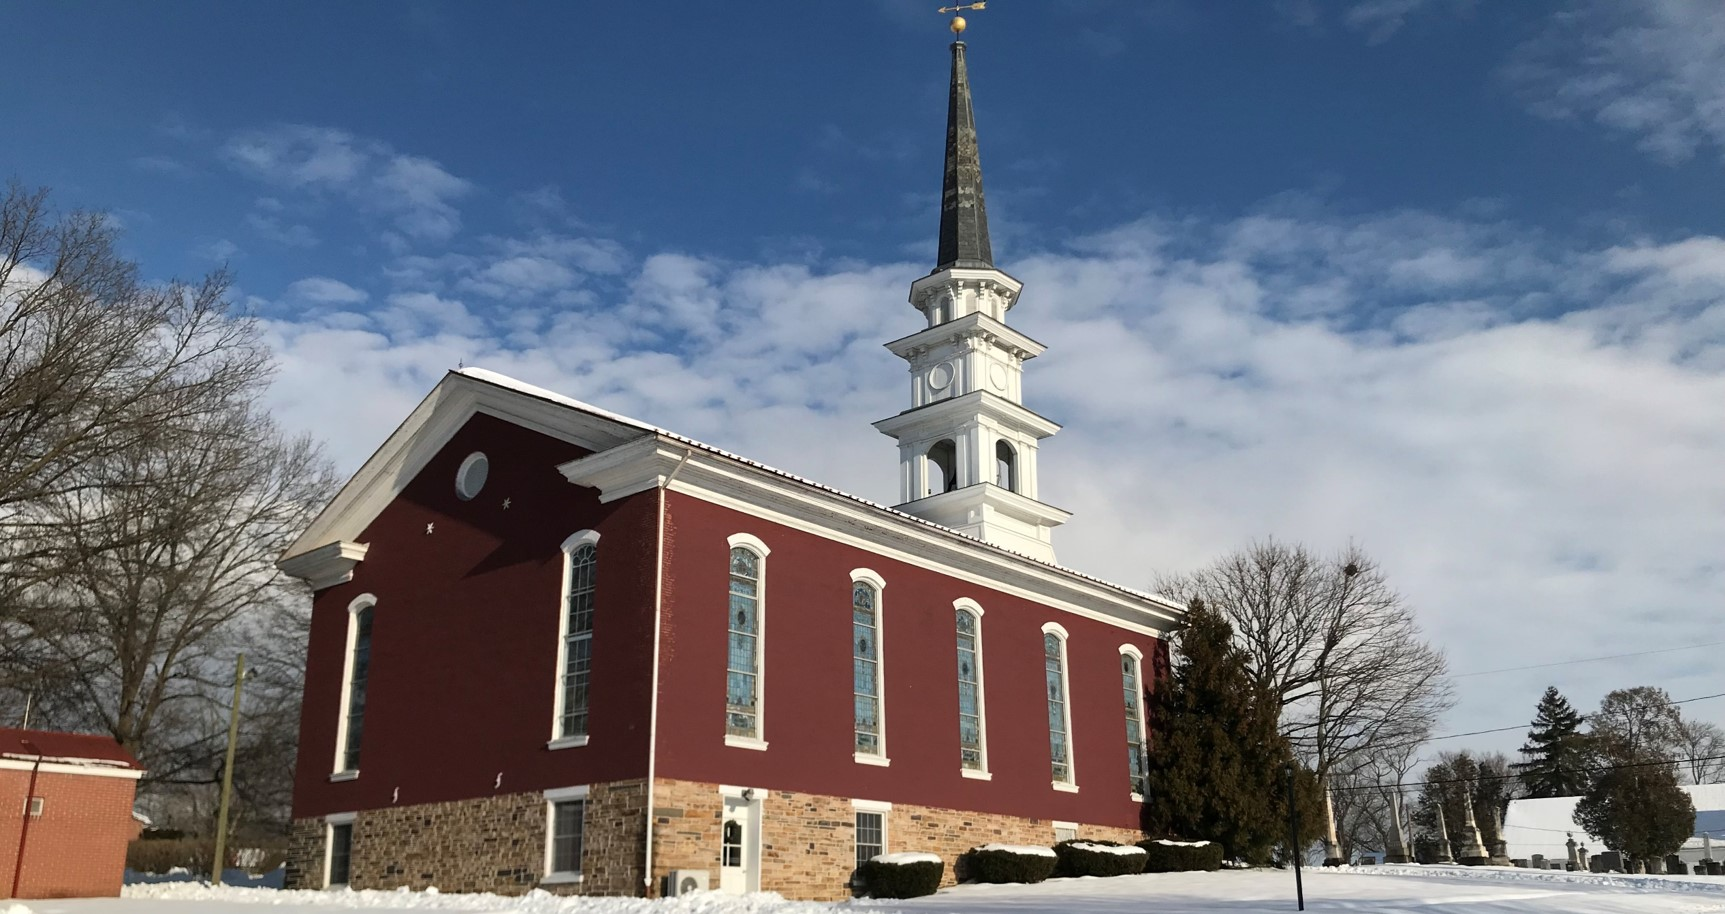 St. Peter's Lutheran Church, Freeburg